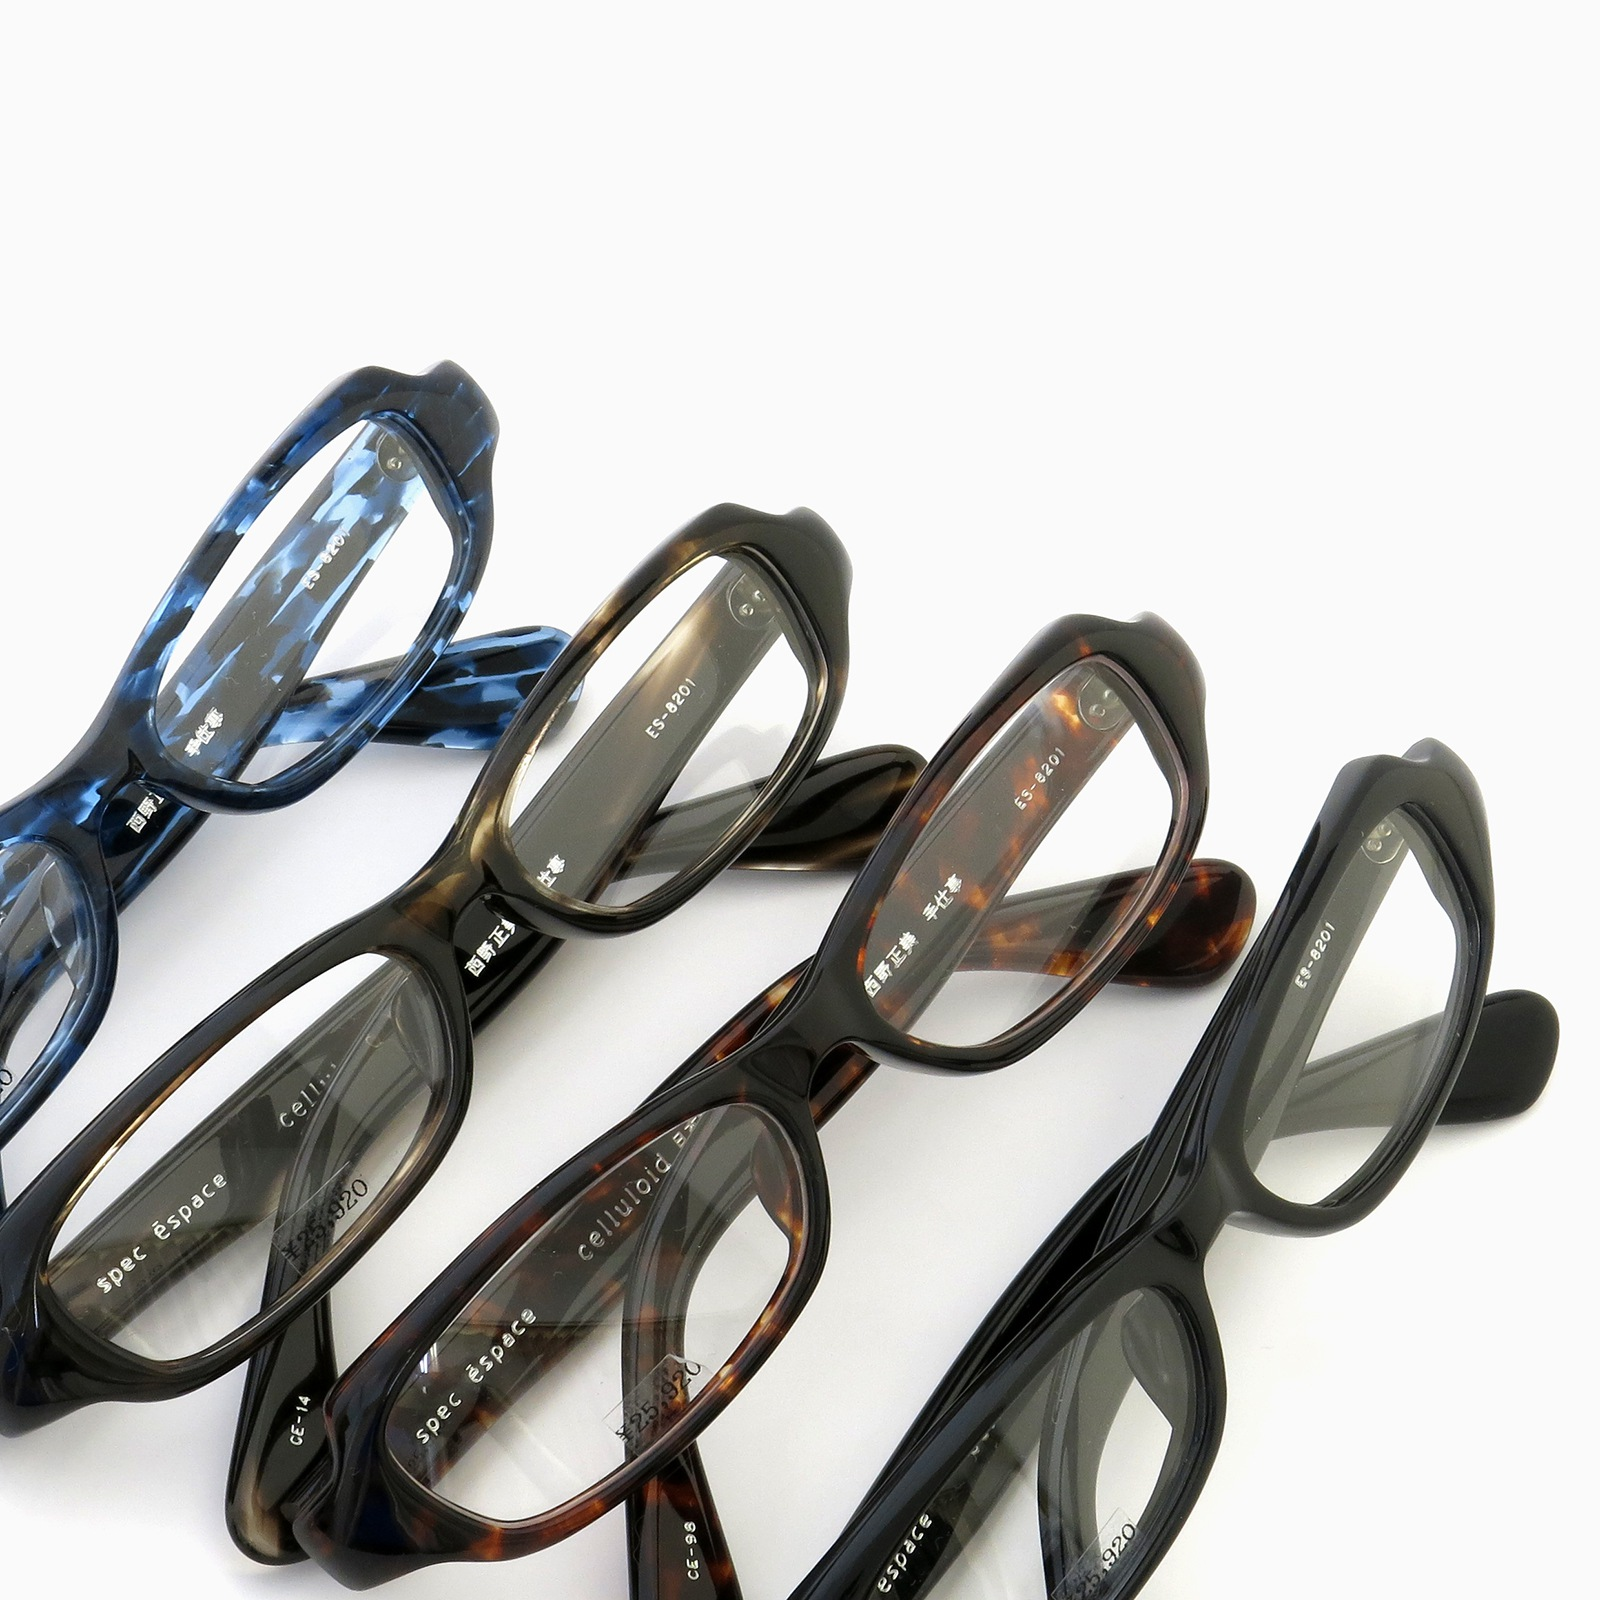 CELLULOID製メガネのロングセラー